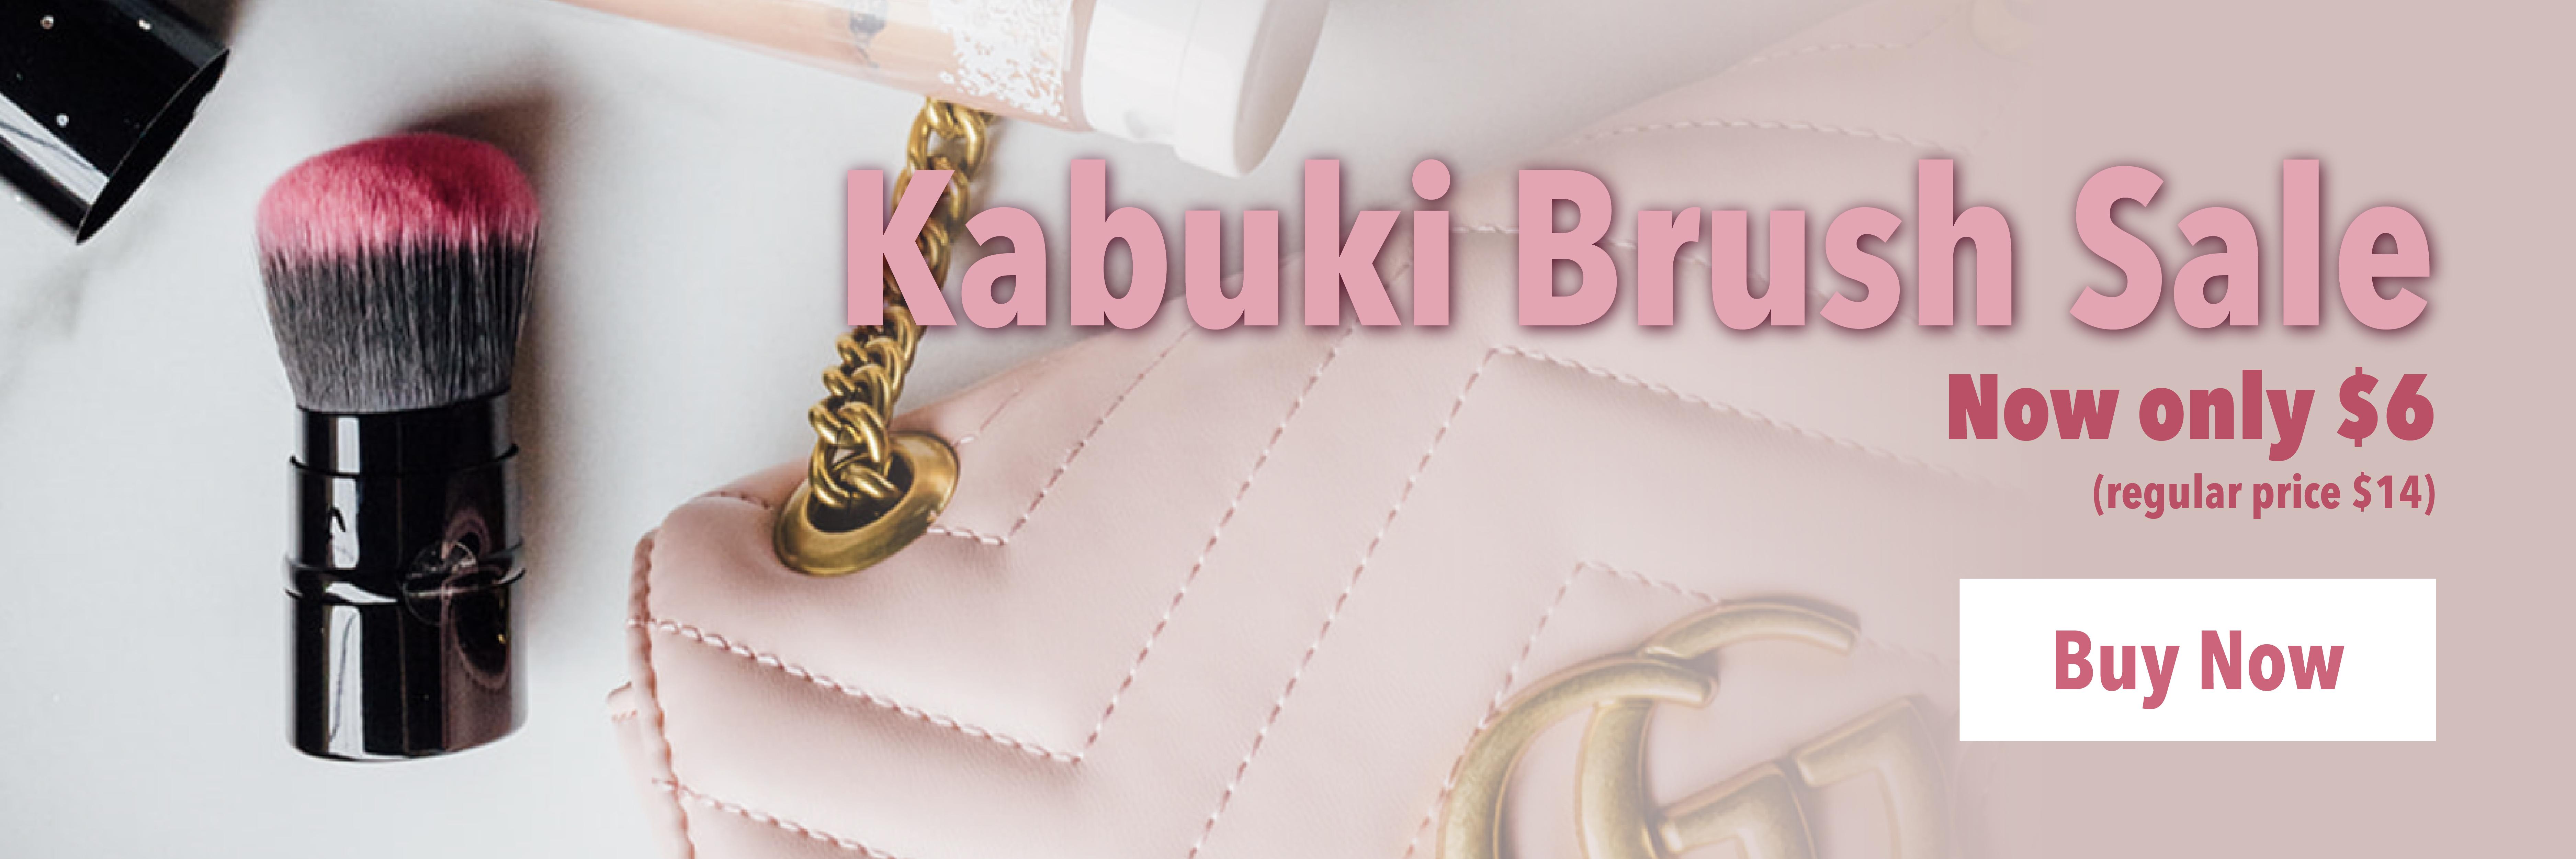 Kabuki Brush on sale for $6